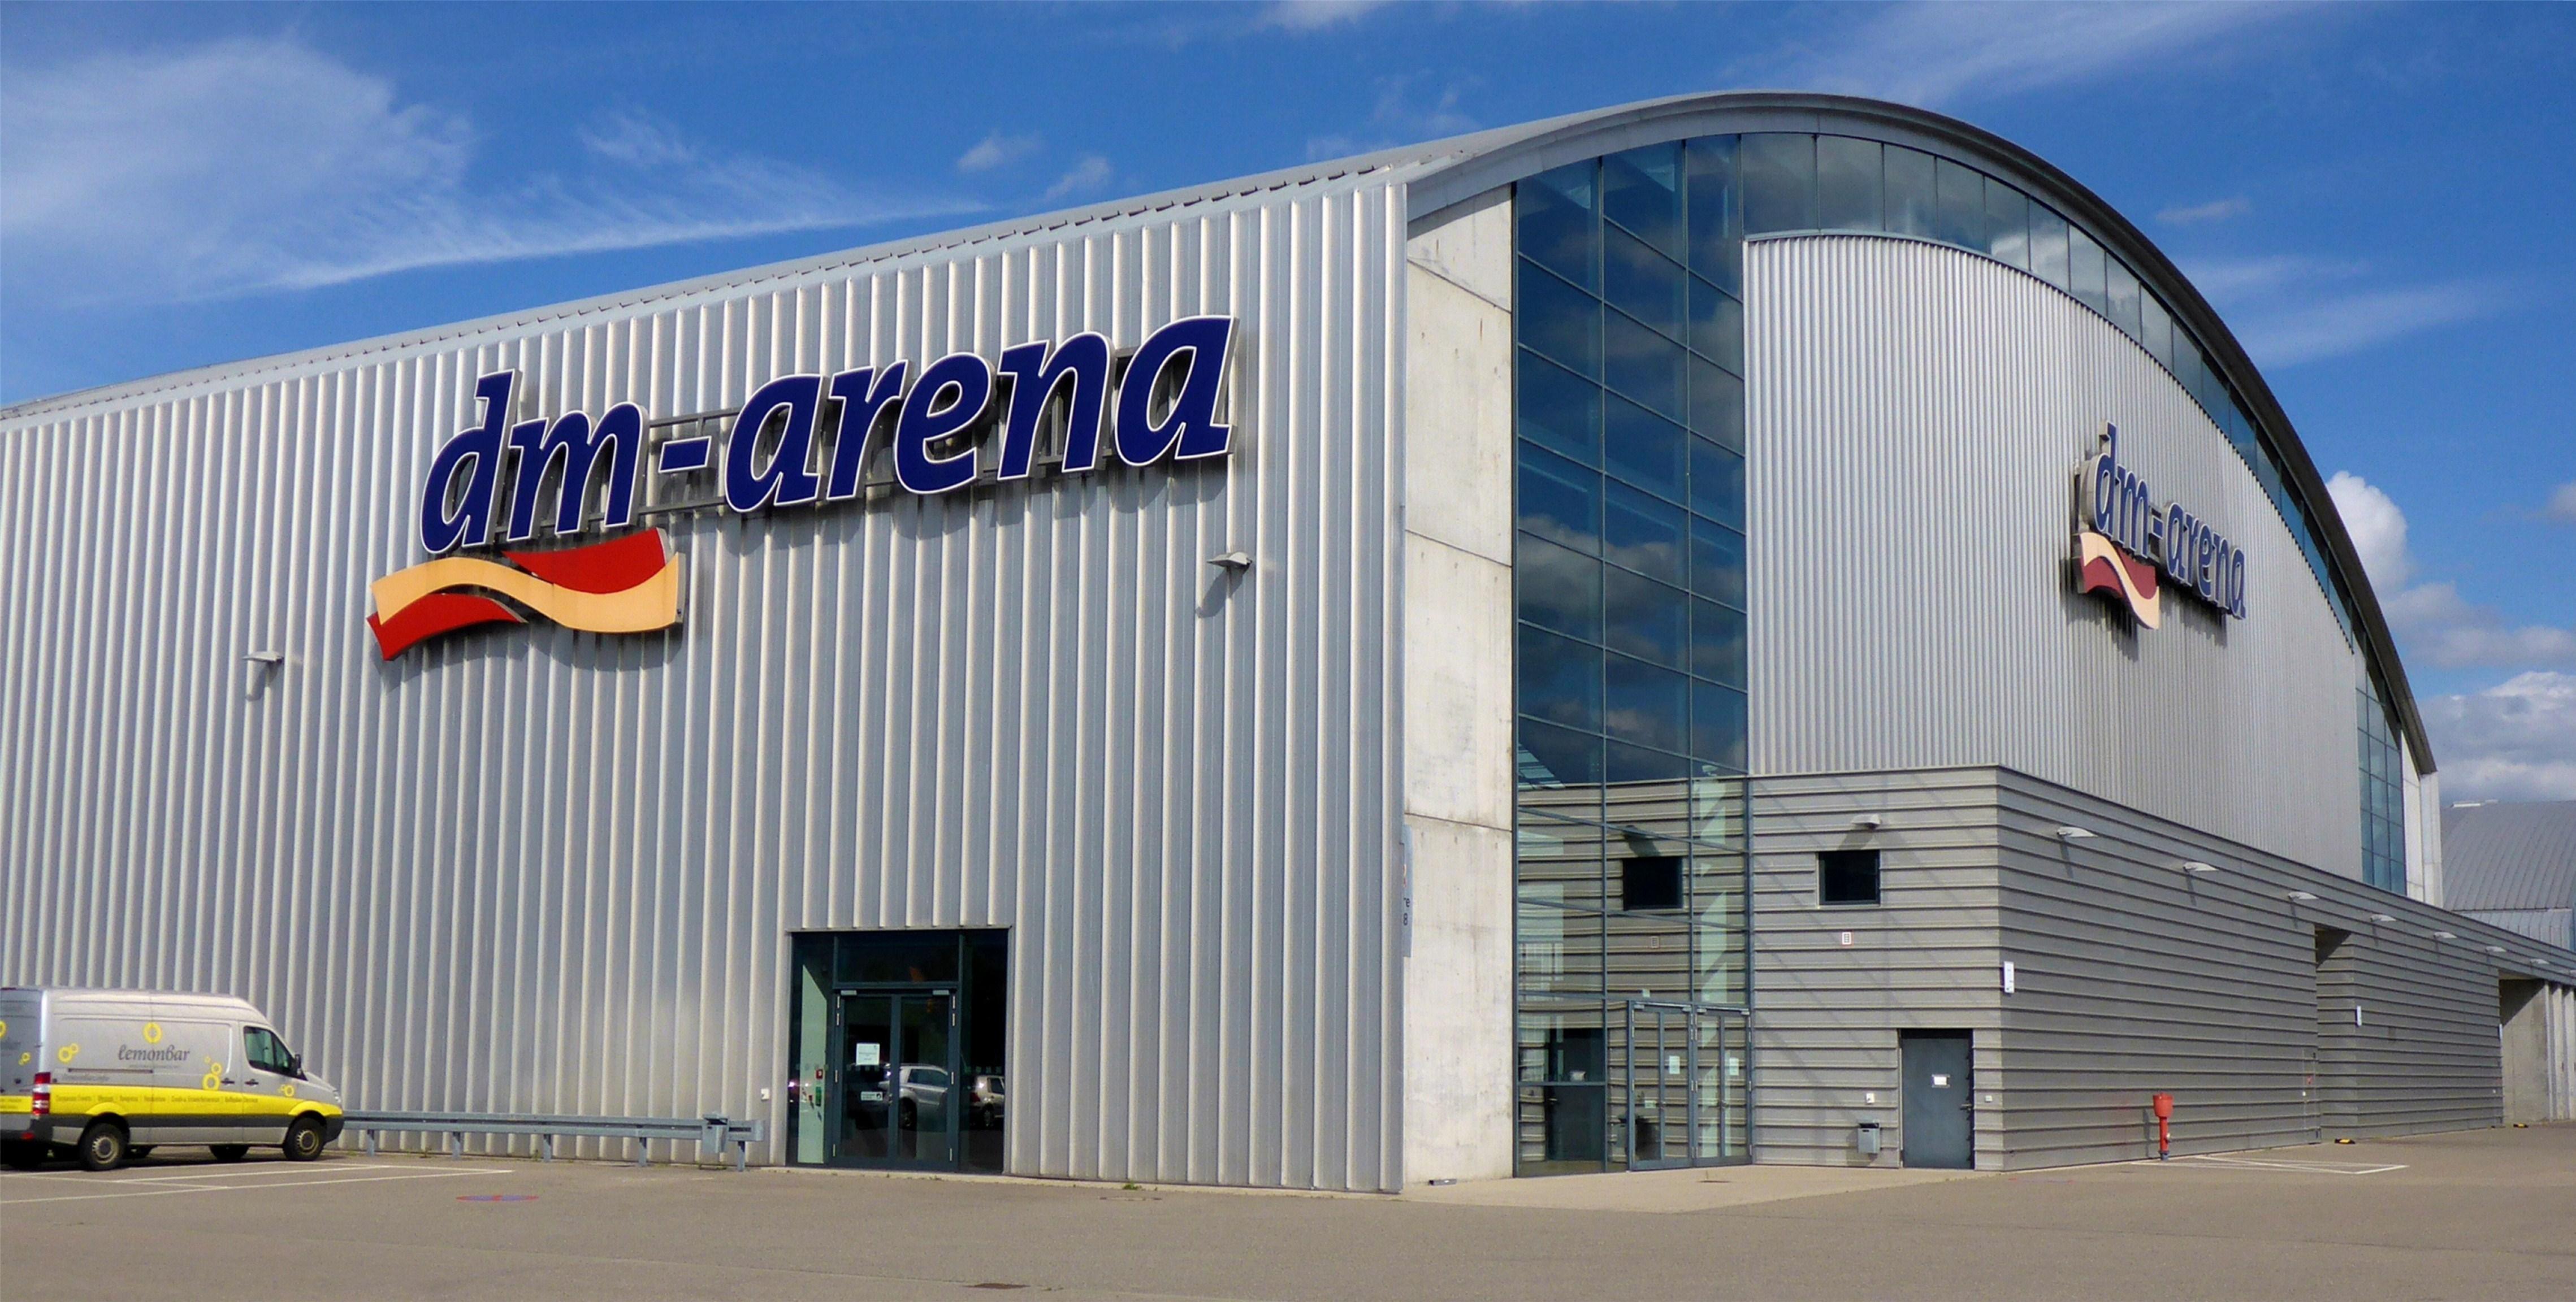 File:Messe Karlsruhe dm Arena.JPG - Wikimedia Commons